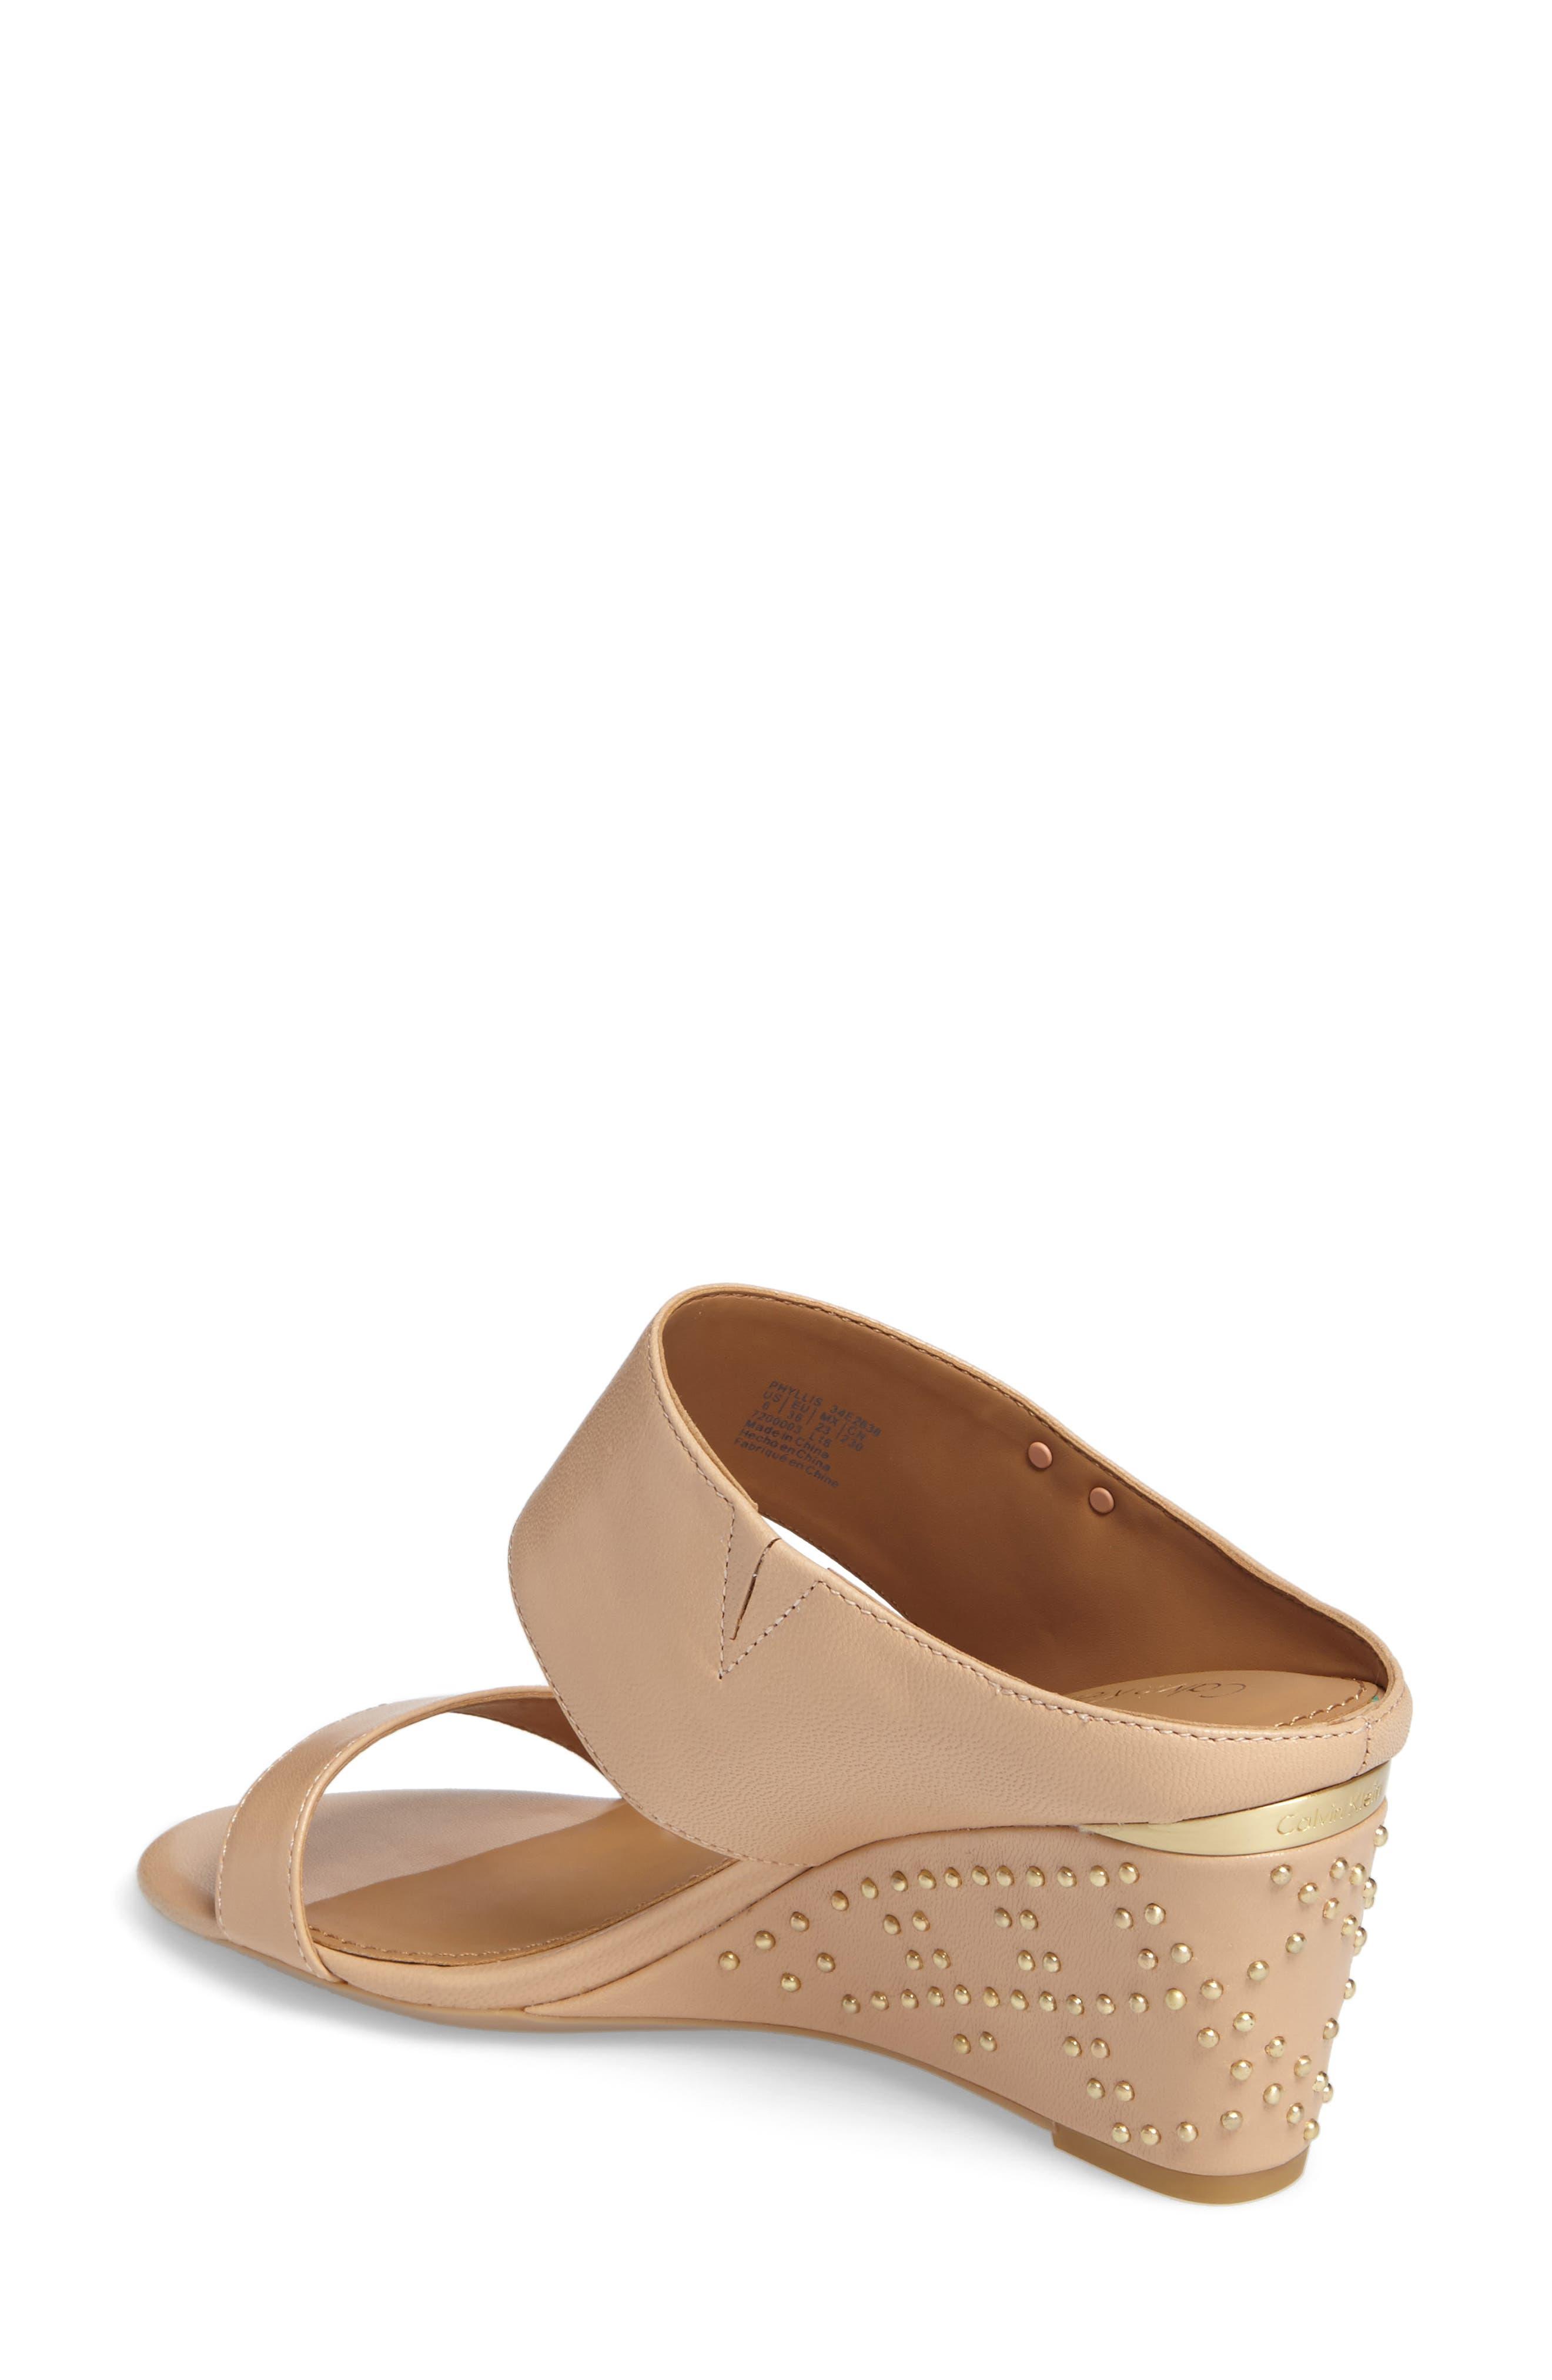 Phyllis Studded Wedge Sandal,                             Alternate thumbnail 8, color,